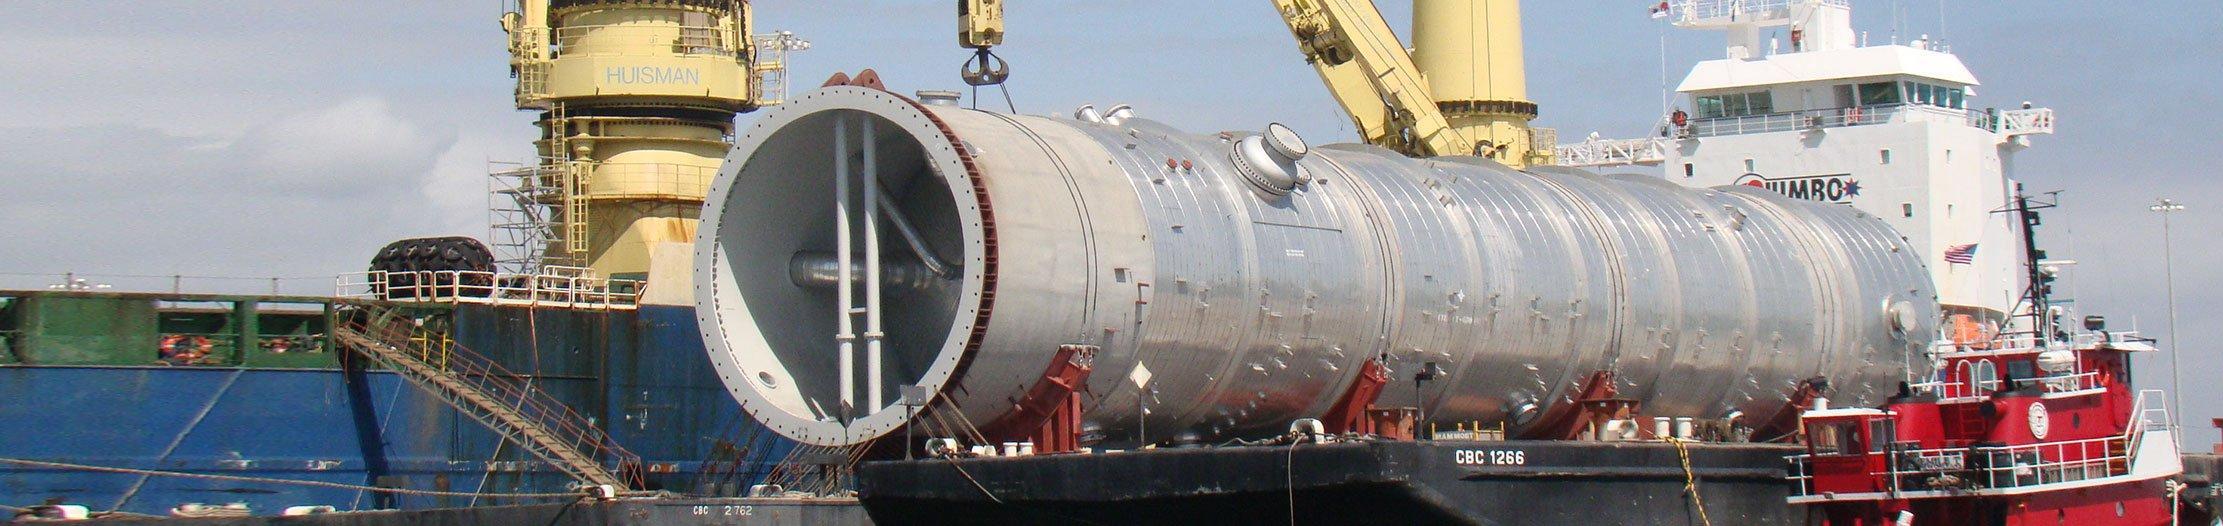 port freeport breakbulk operations